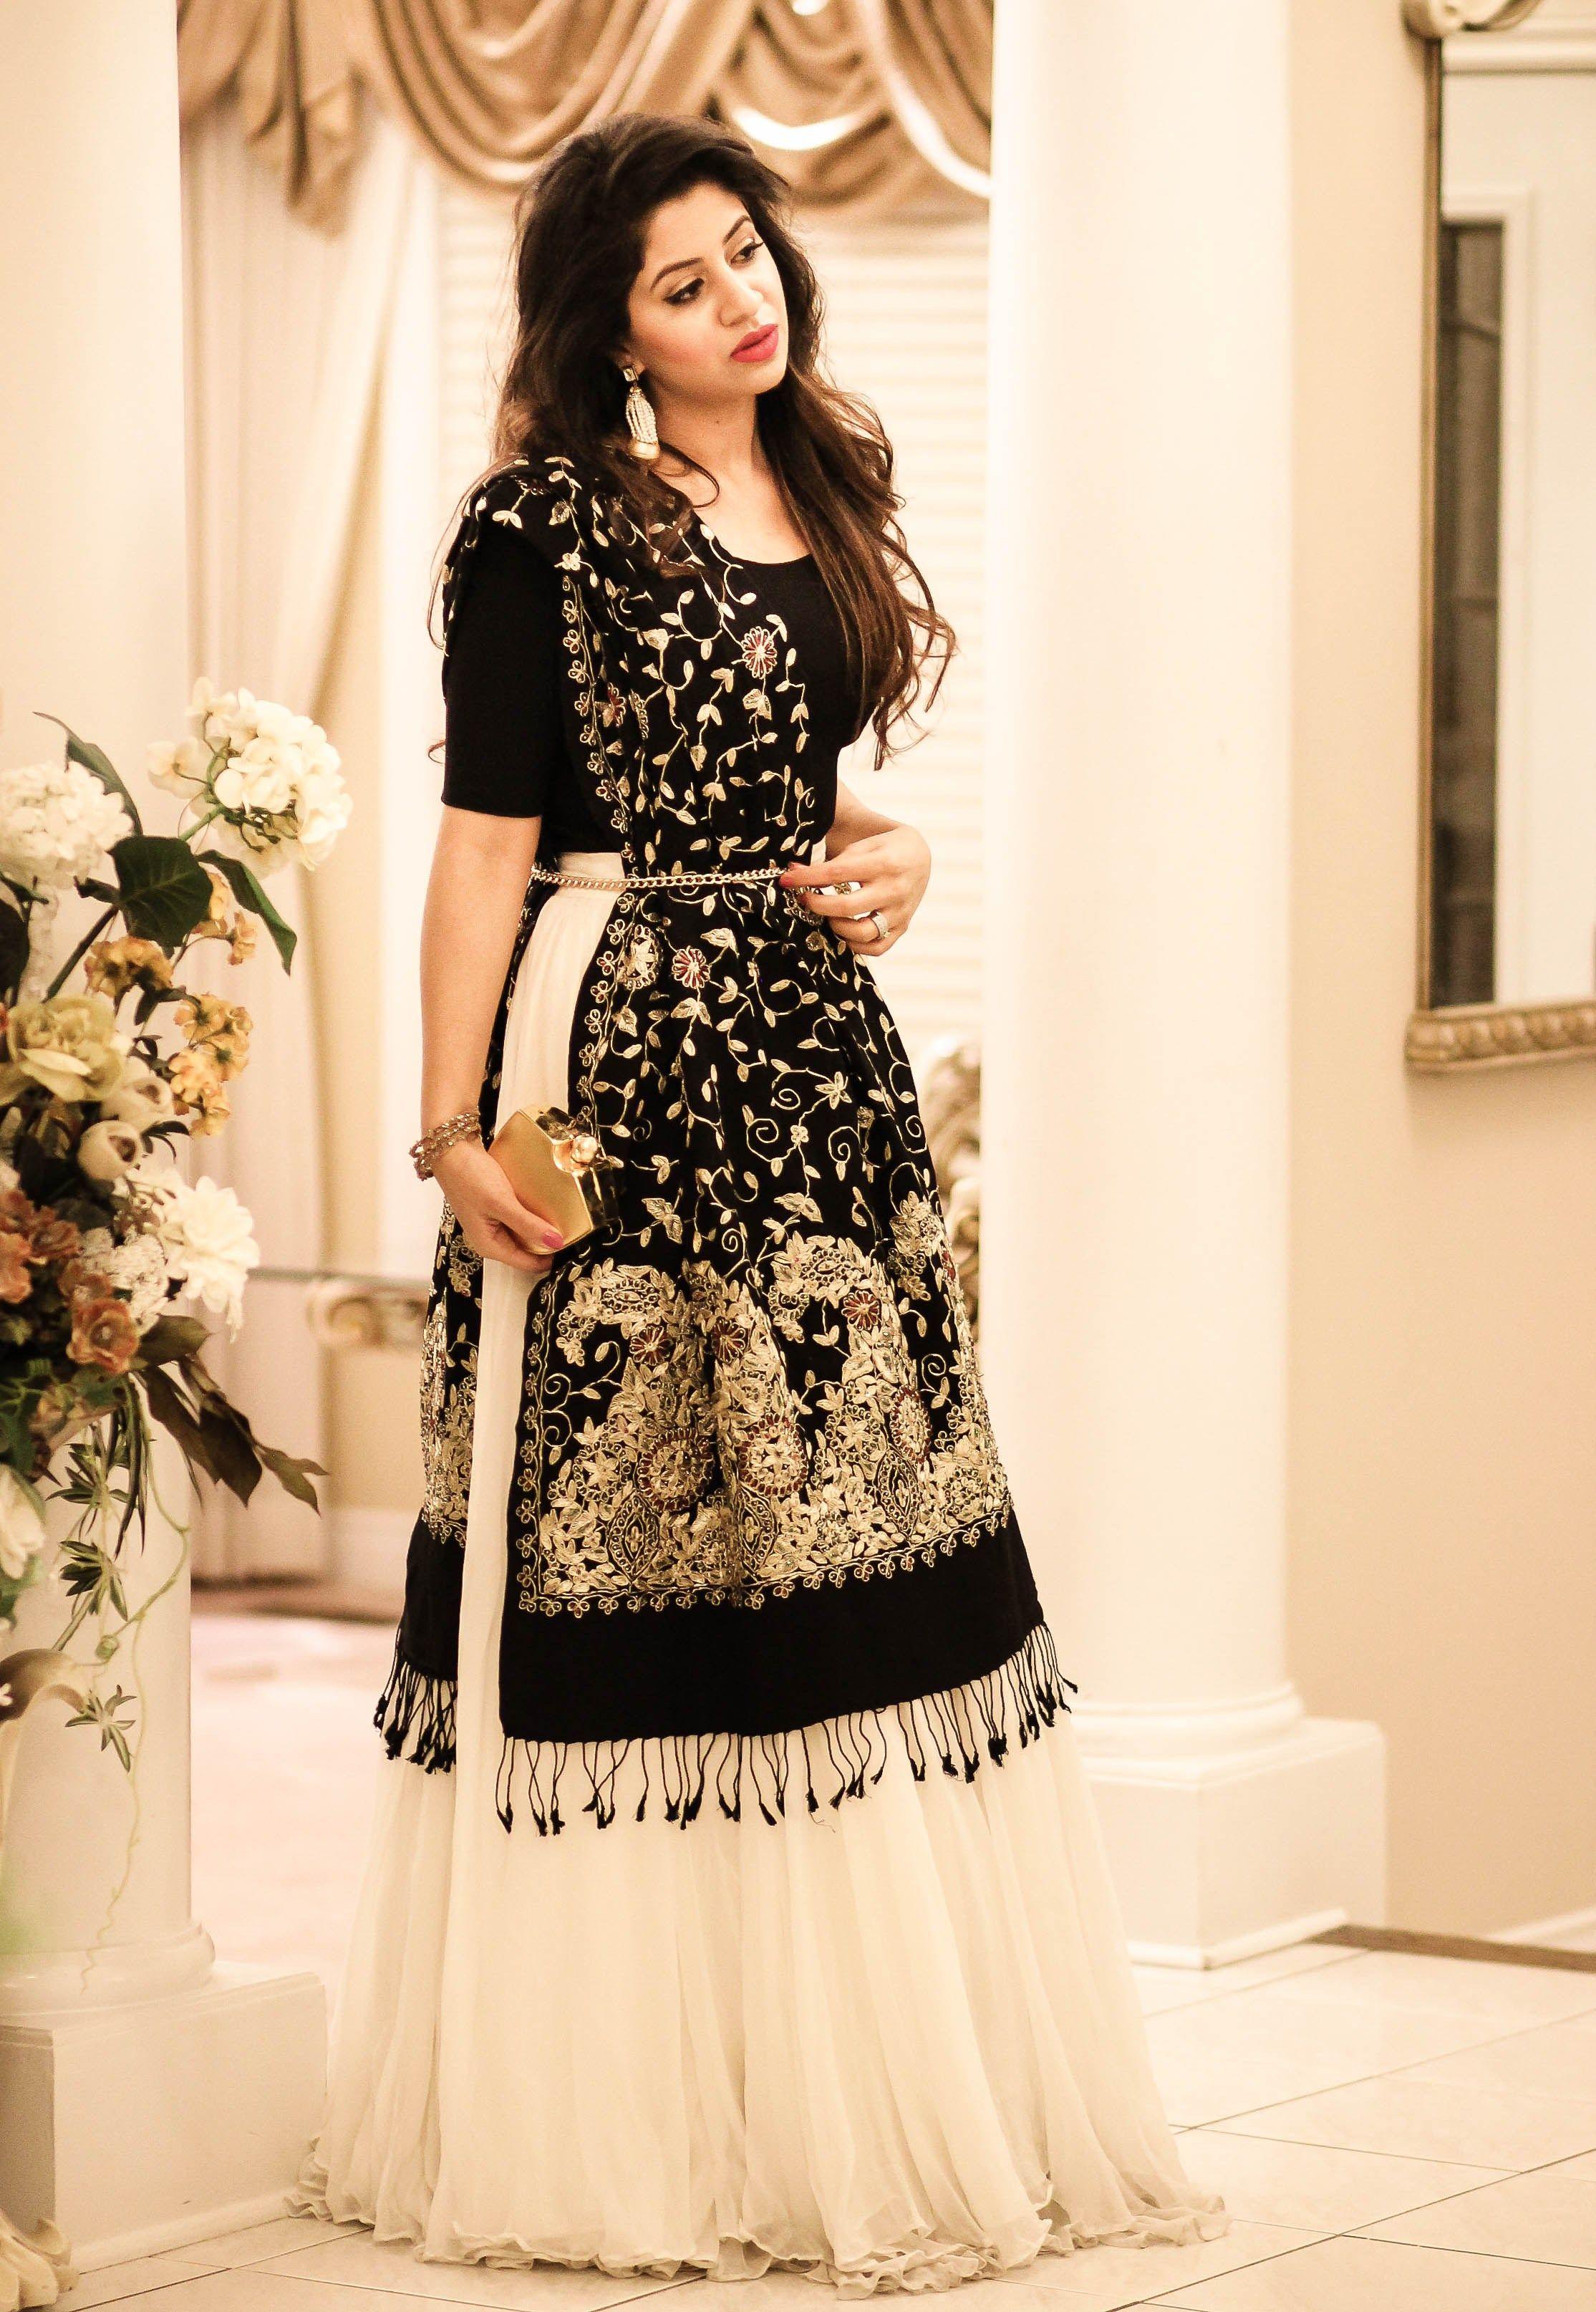 I am loving the trending fashion of lehngas/flowy skirts